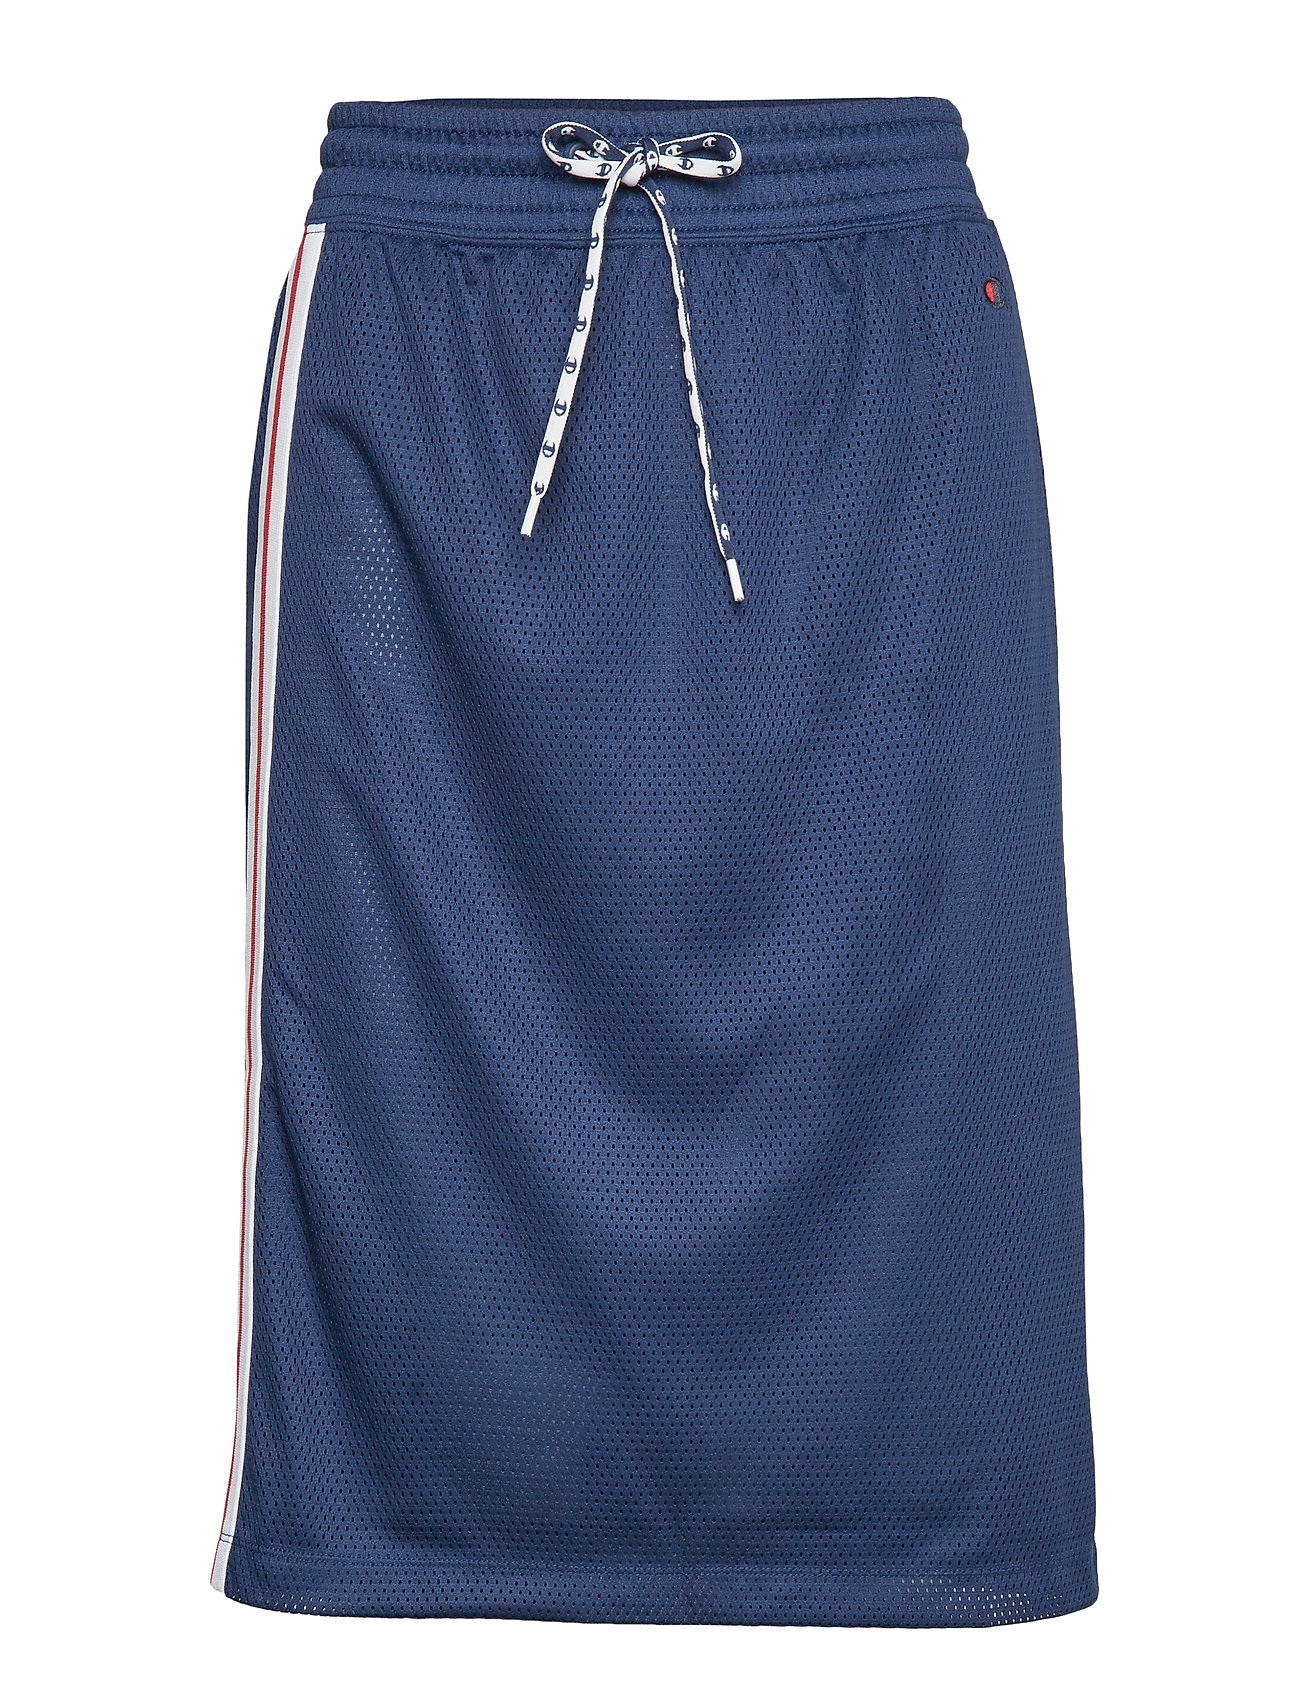 Champion Rochester Skirt - DARK BLUE